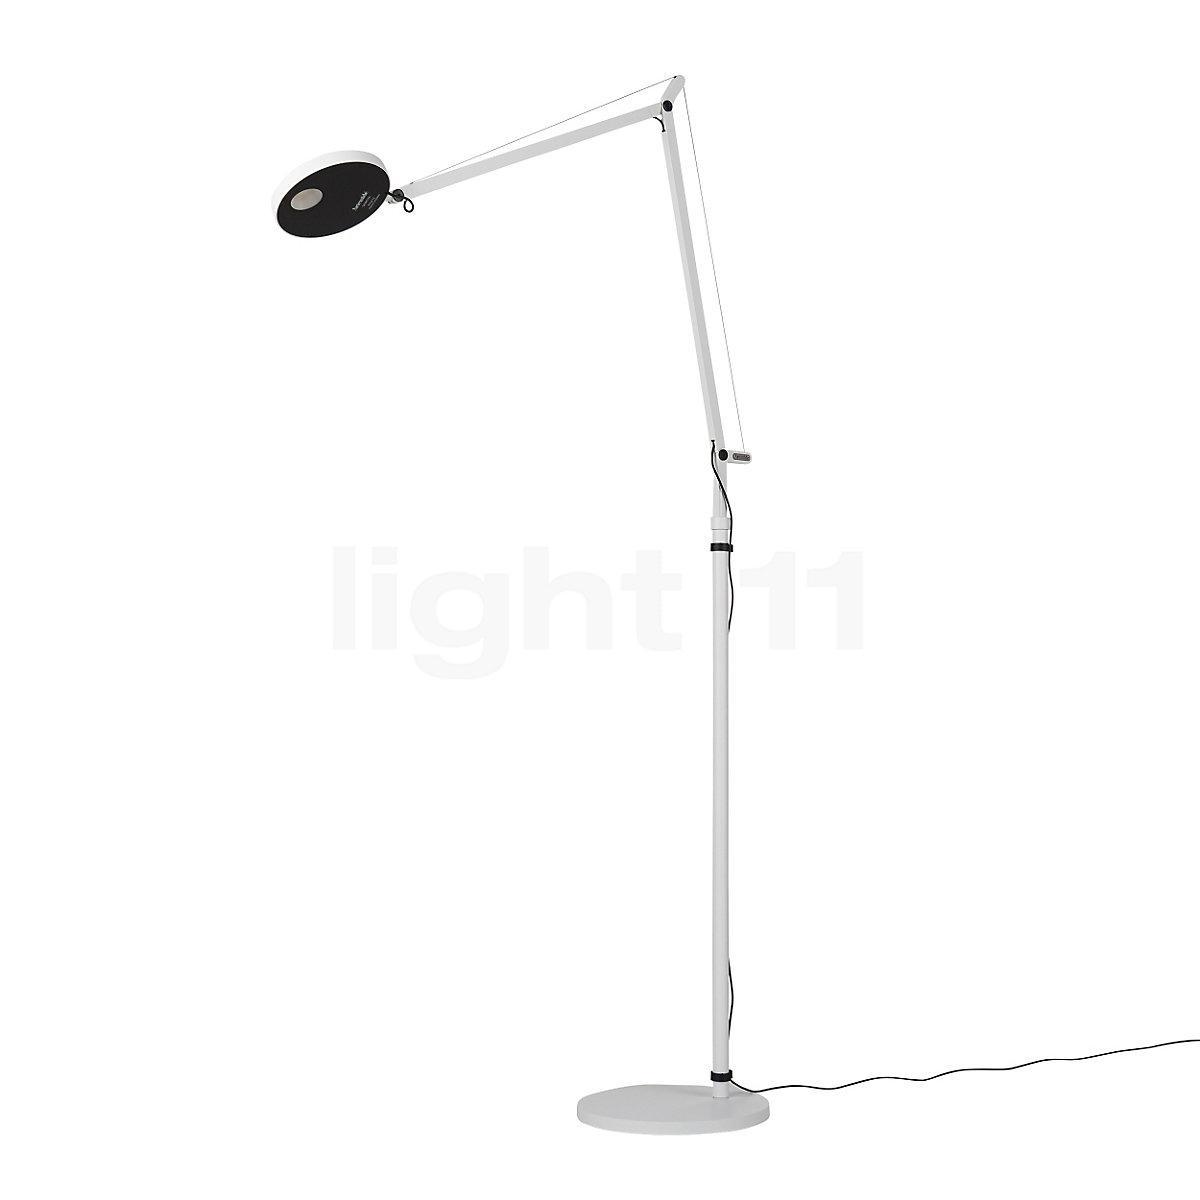 Artemide Stehlampe Klassiker